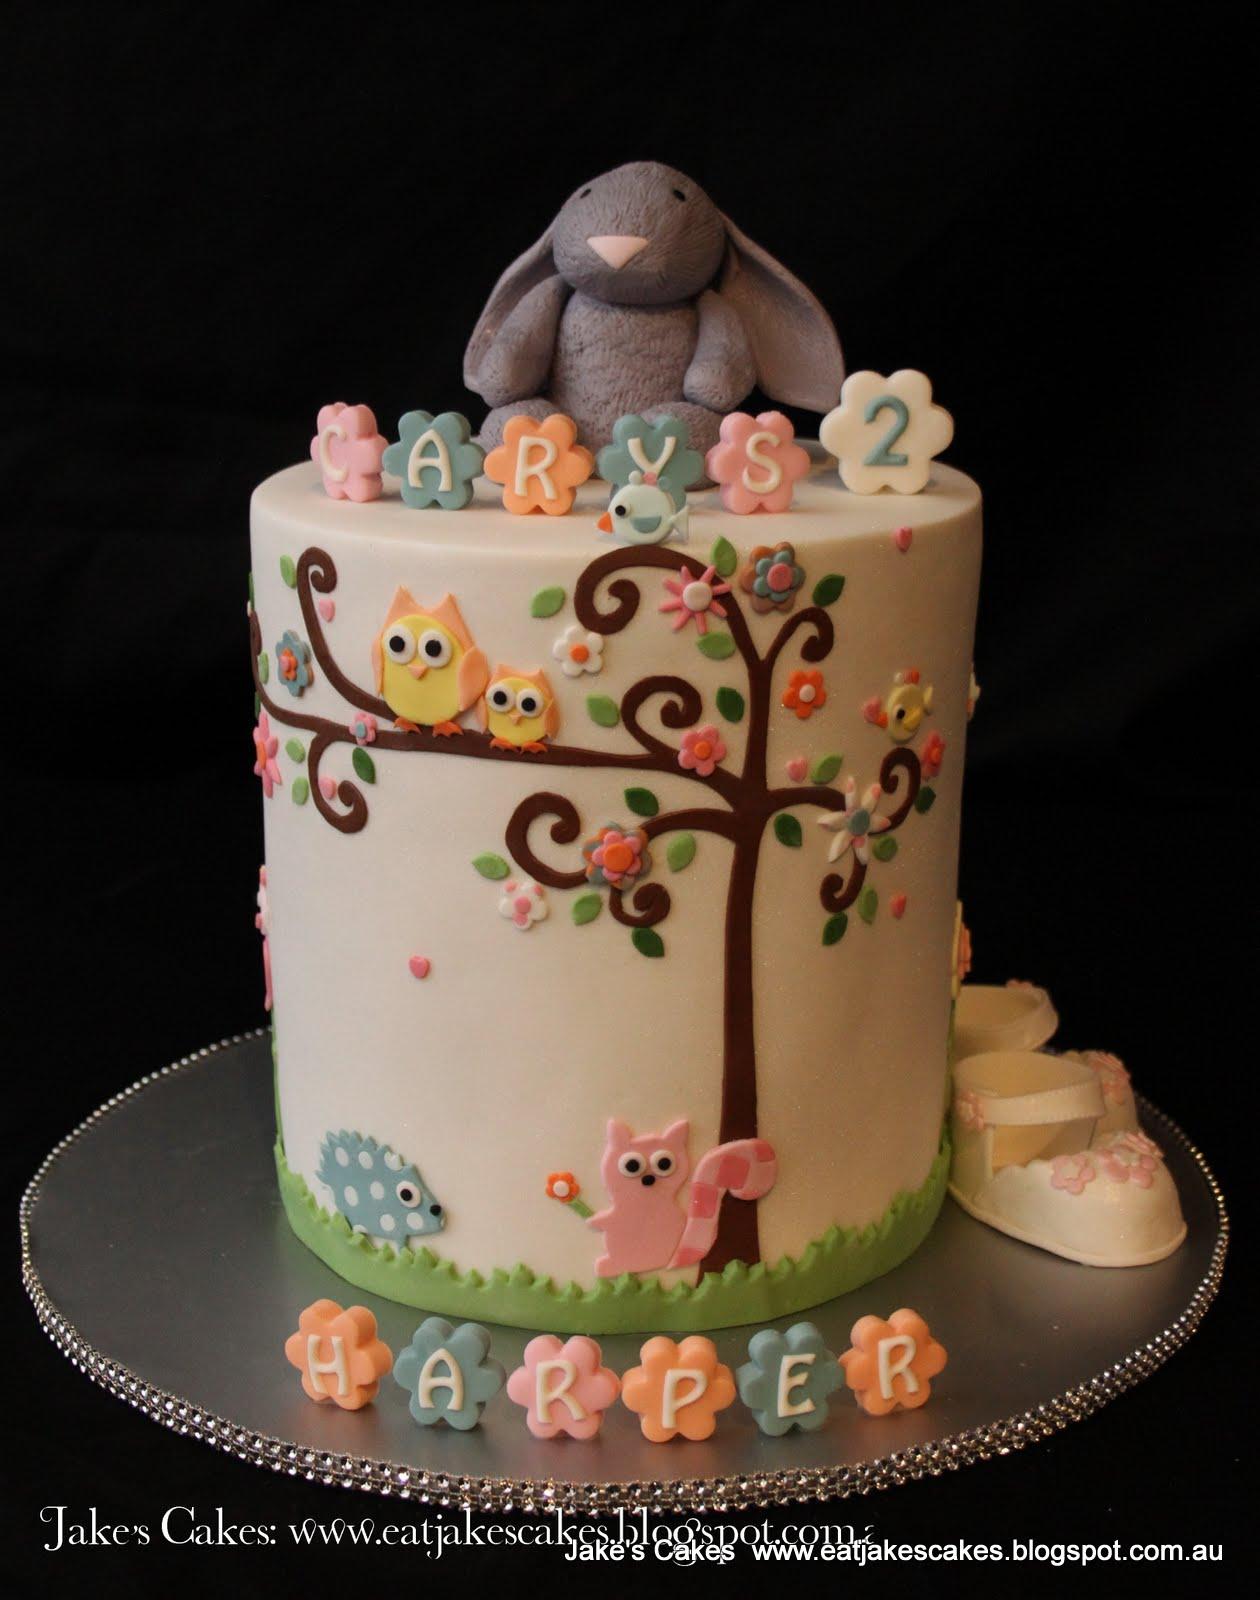 Jakes Cakes Carys 2nd Birthday Cake